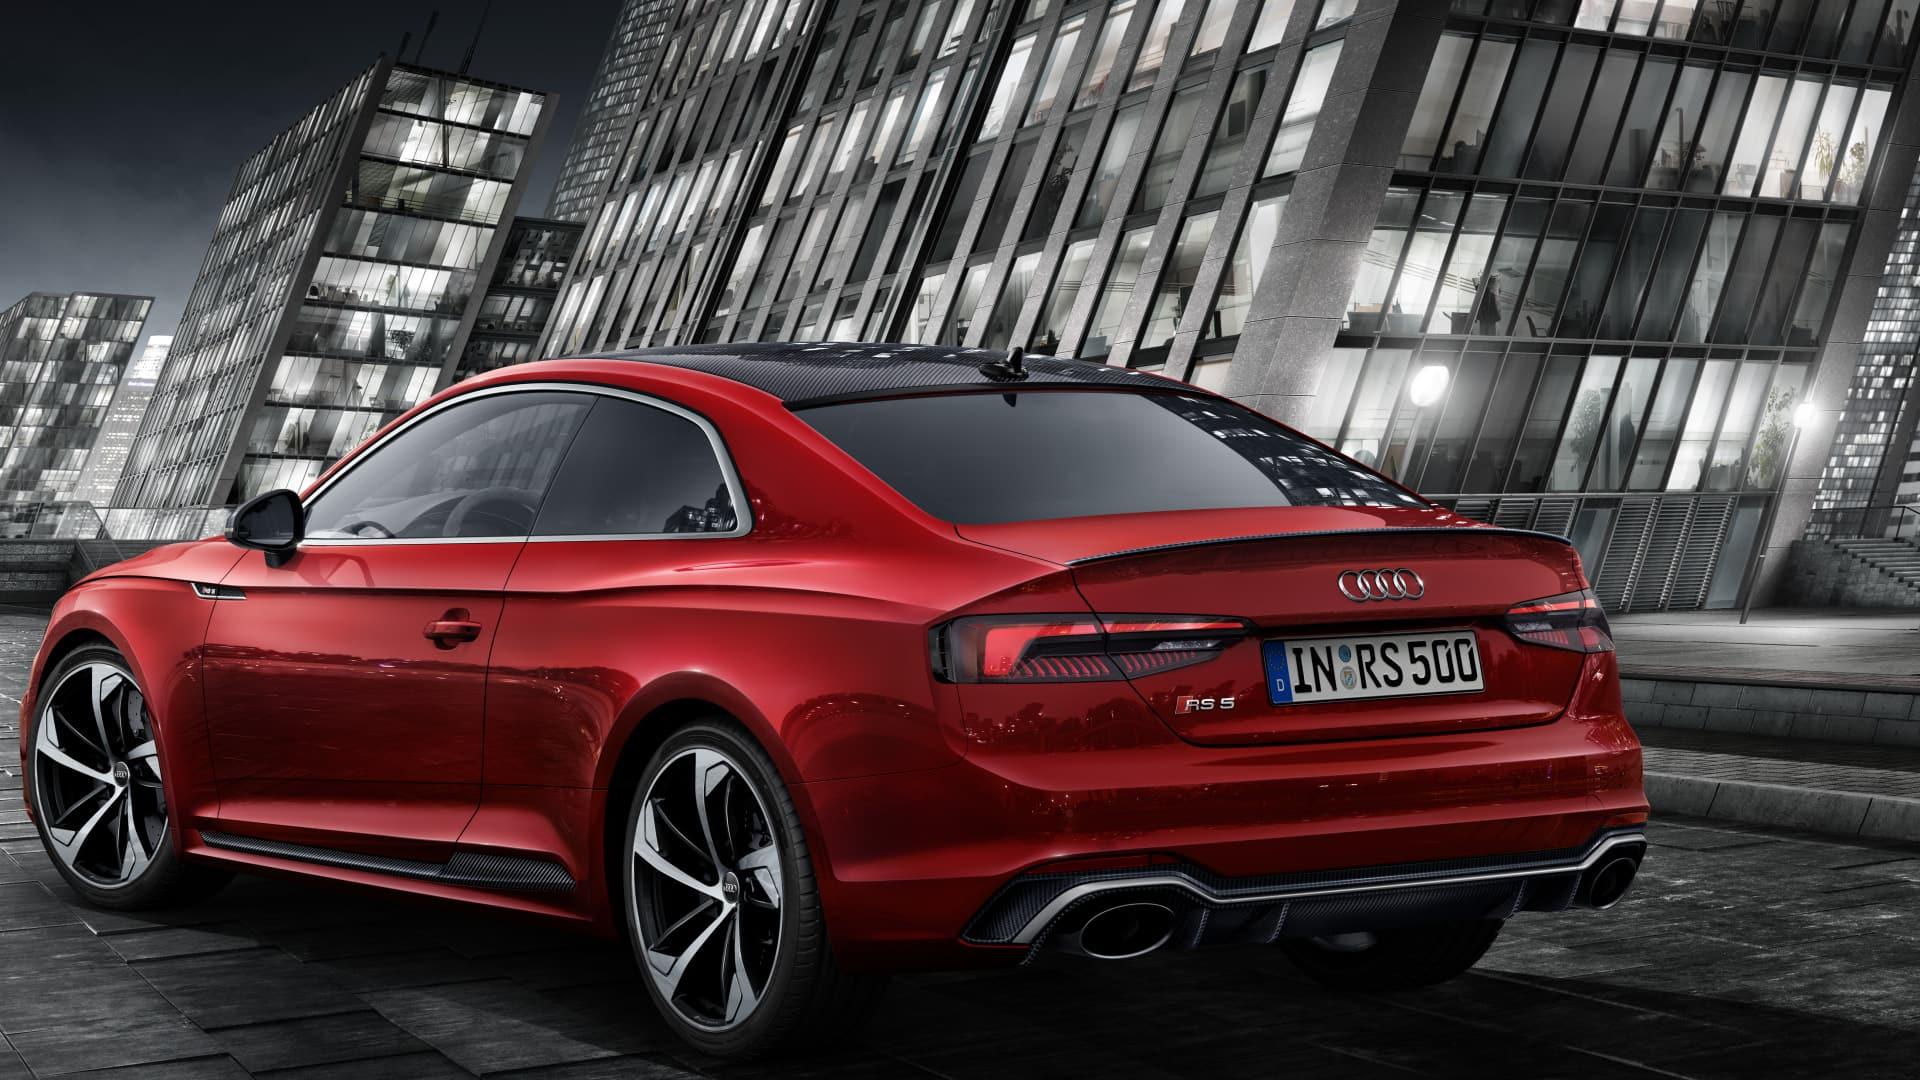 RS Coupé Audi Ireland - Audi audi